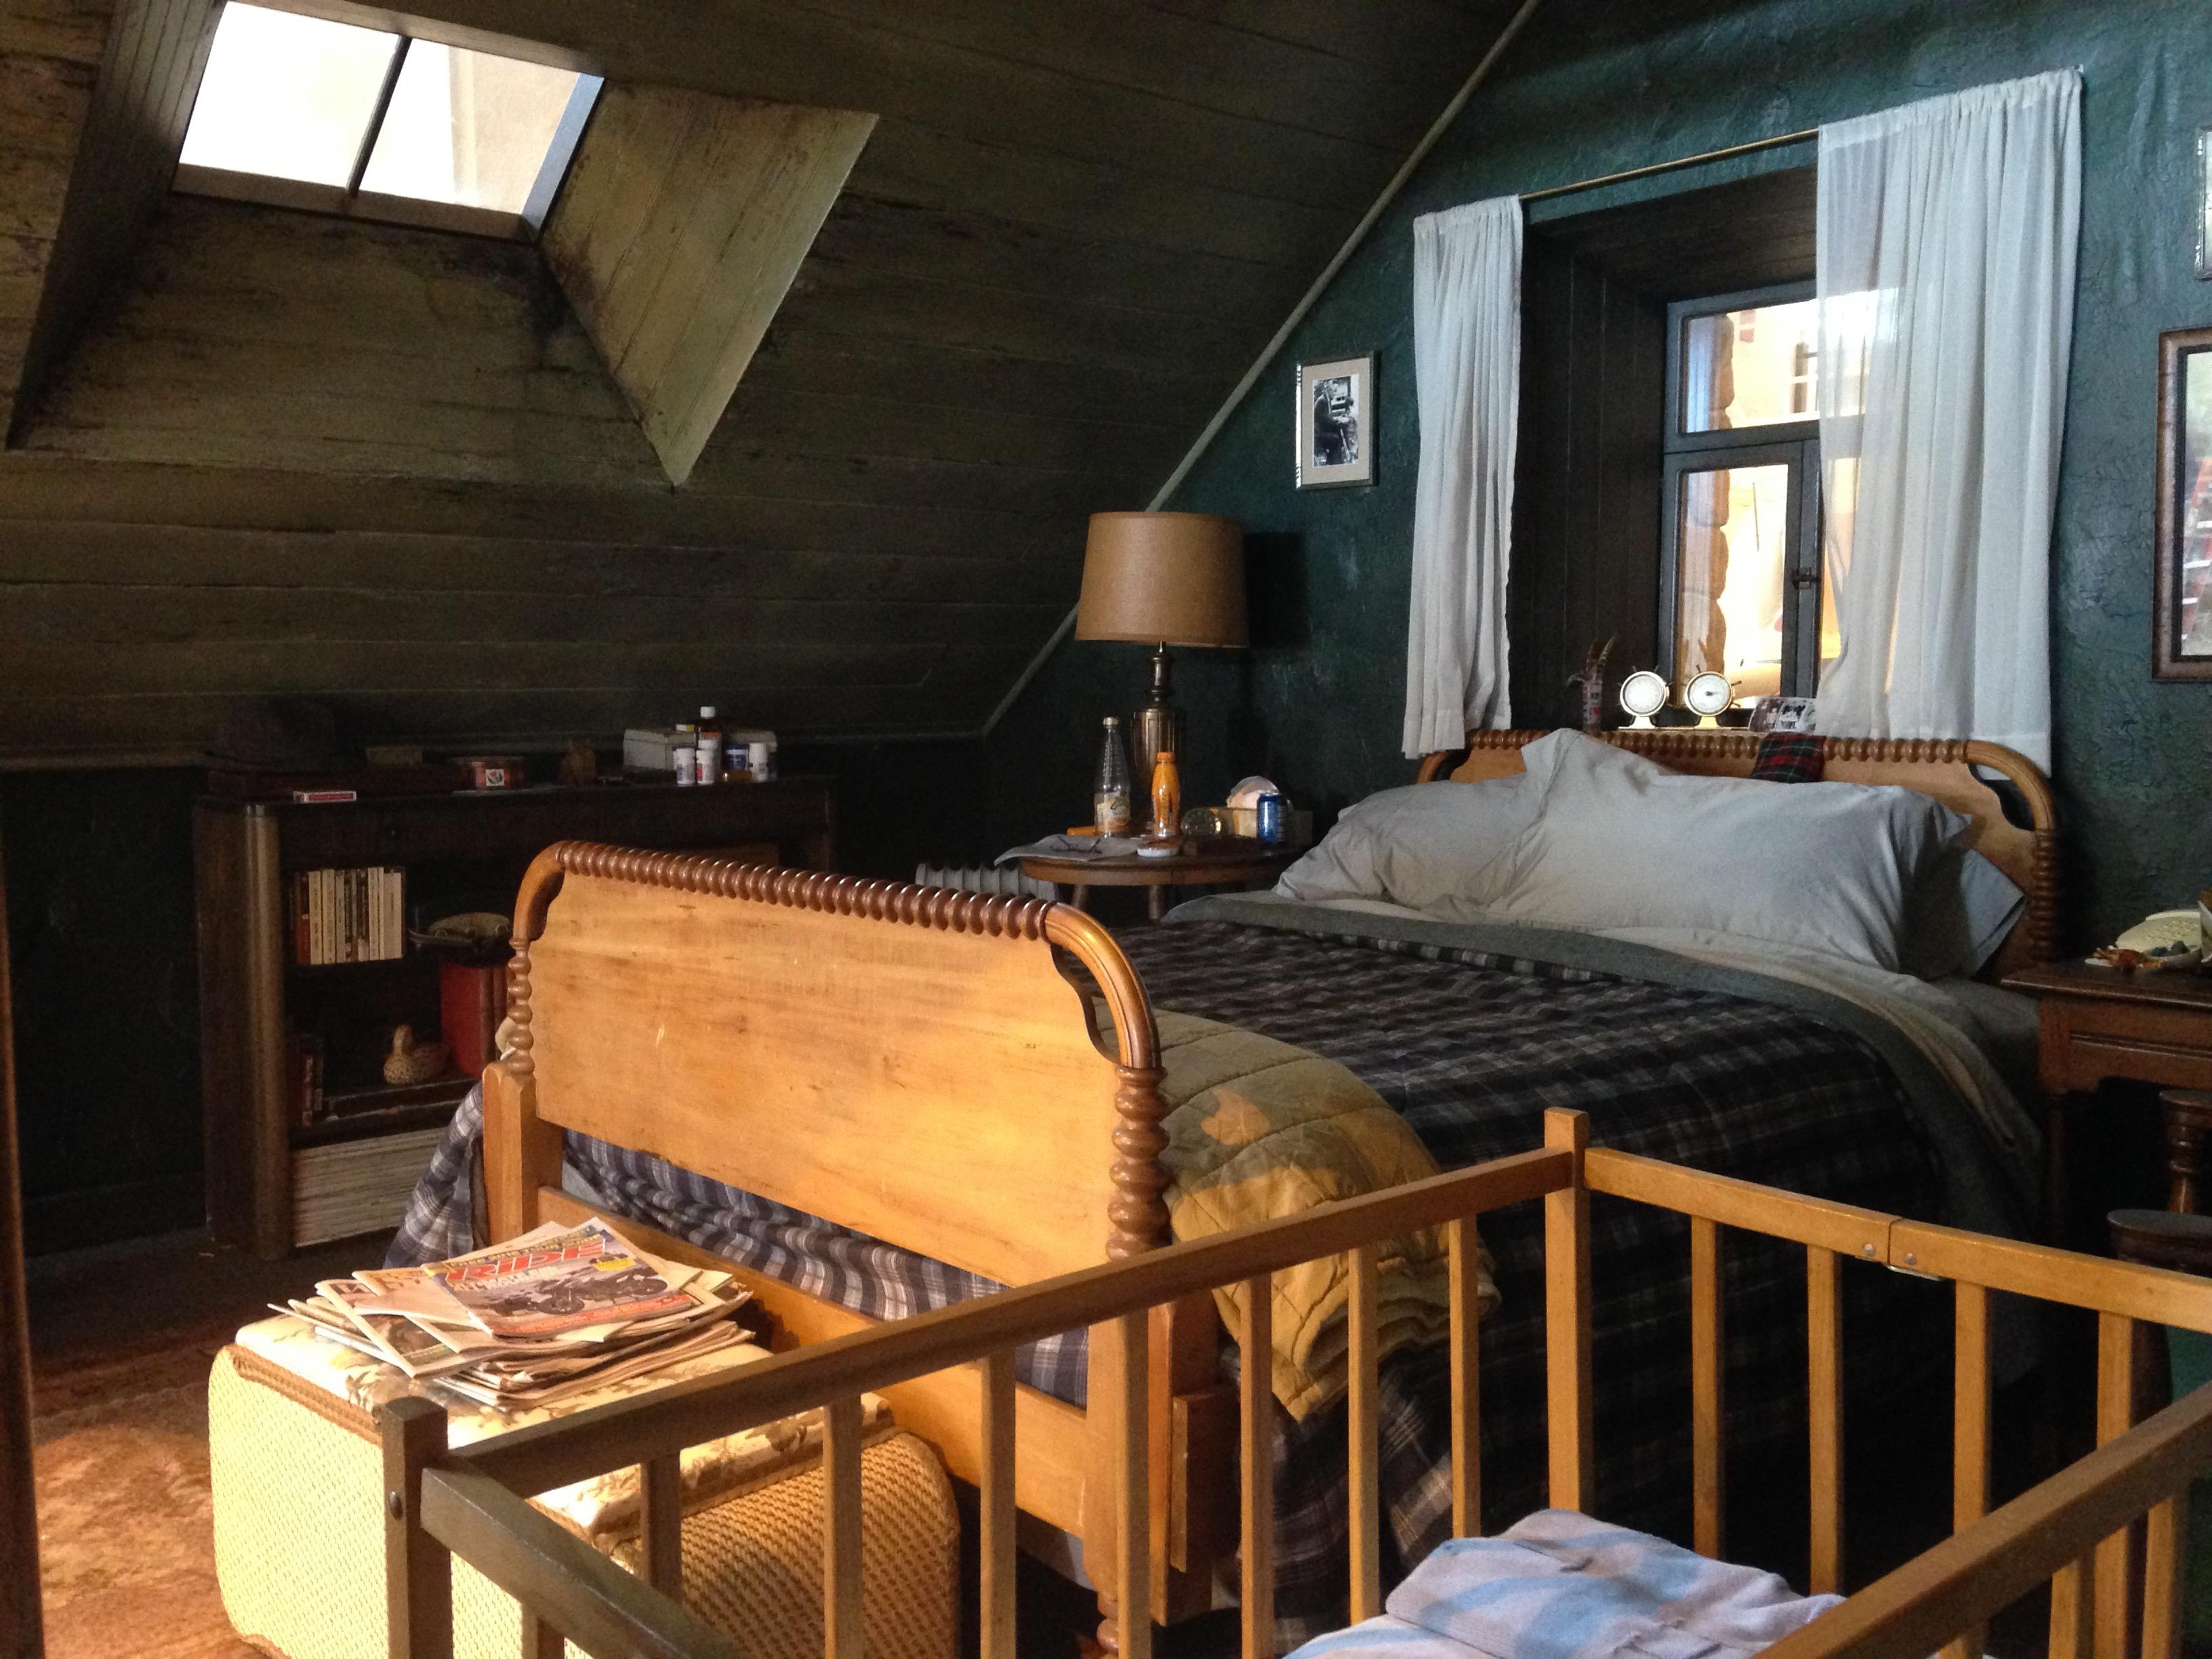 Rory Bedroom set